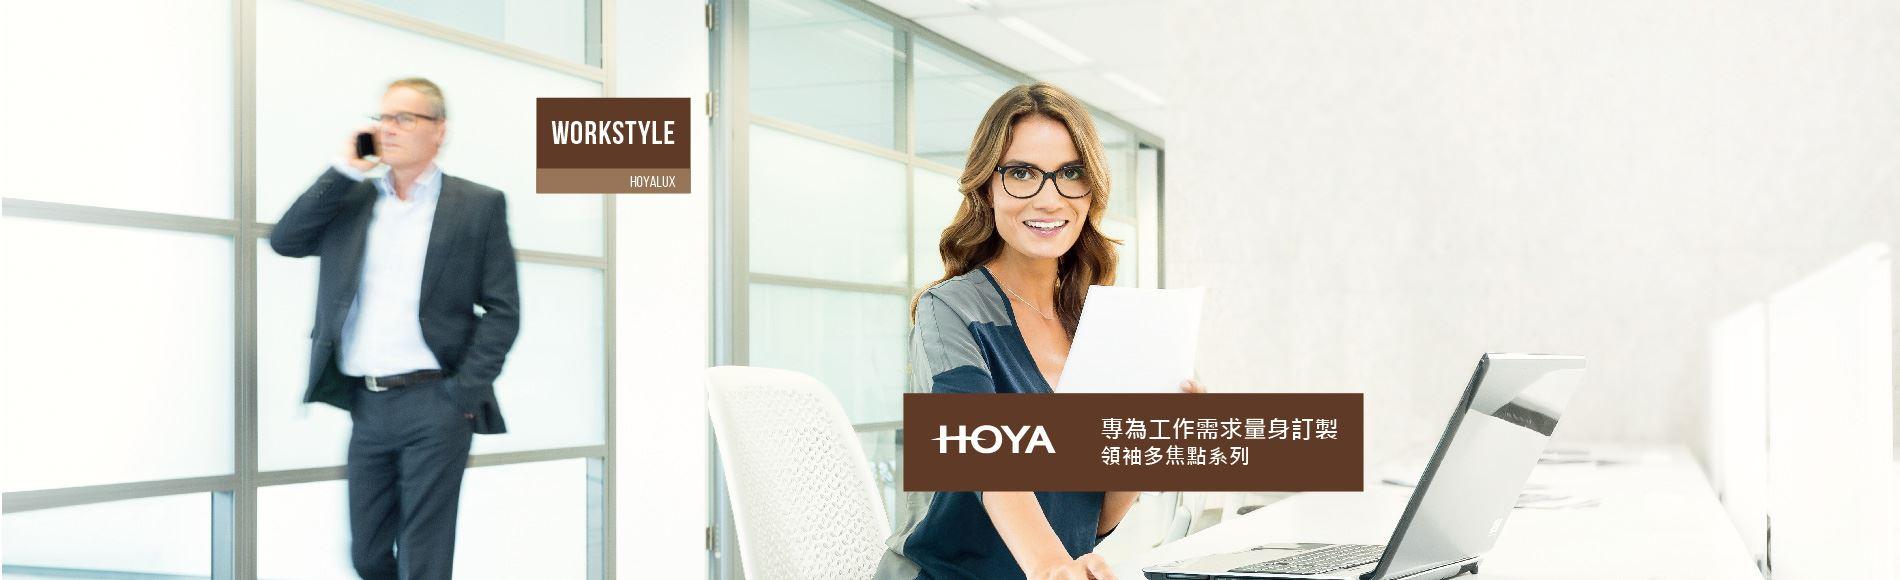 HOYA 鏡片